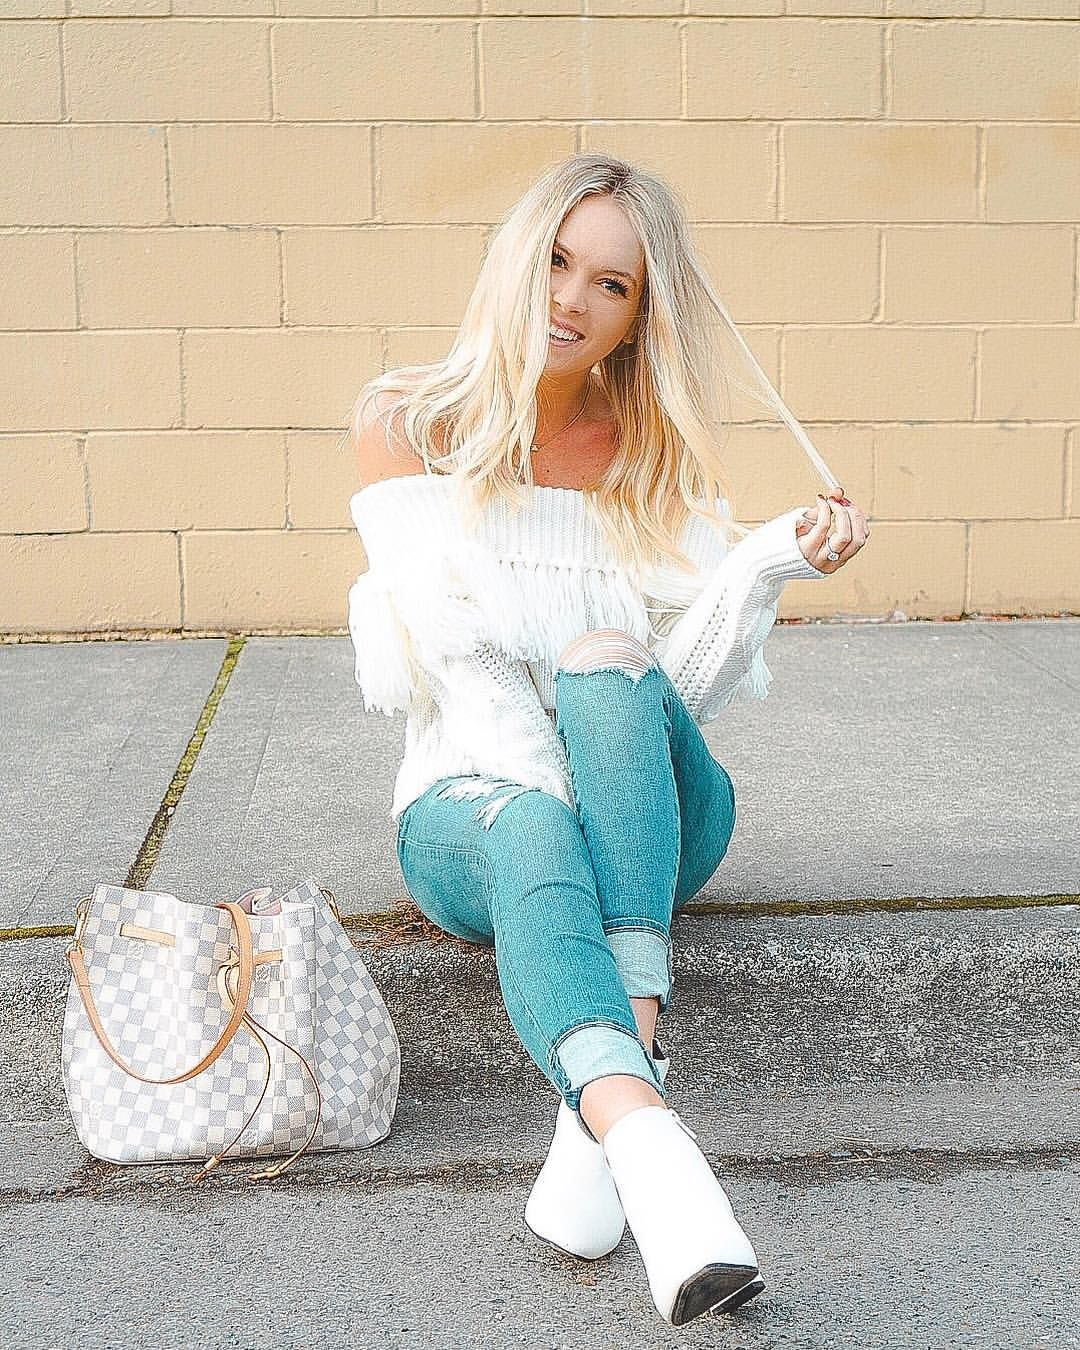 Fall Style Winter Outfits Spring Fashion Chicwish Sweater Topshop Denim Louis Vuitton Girolata Karlierae